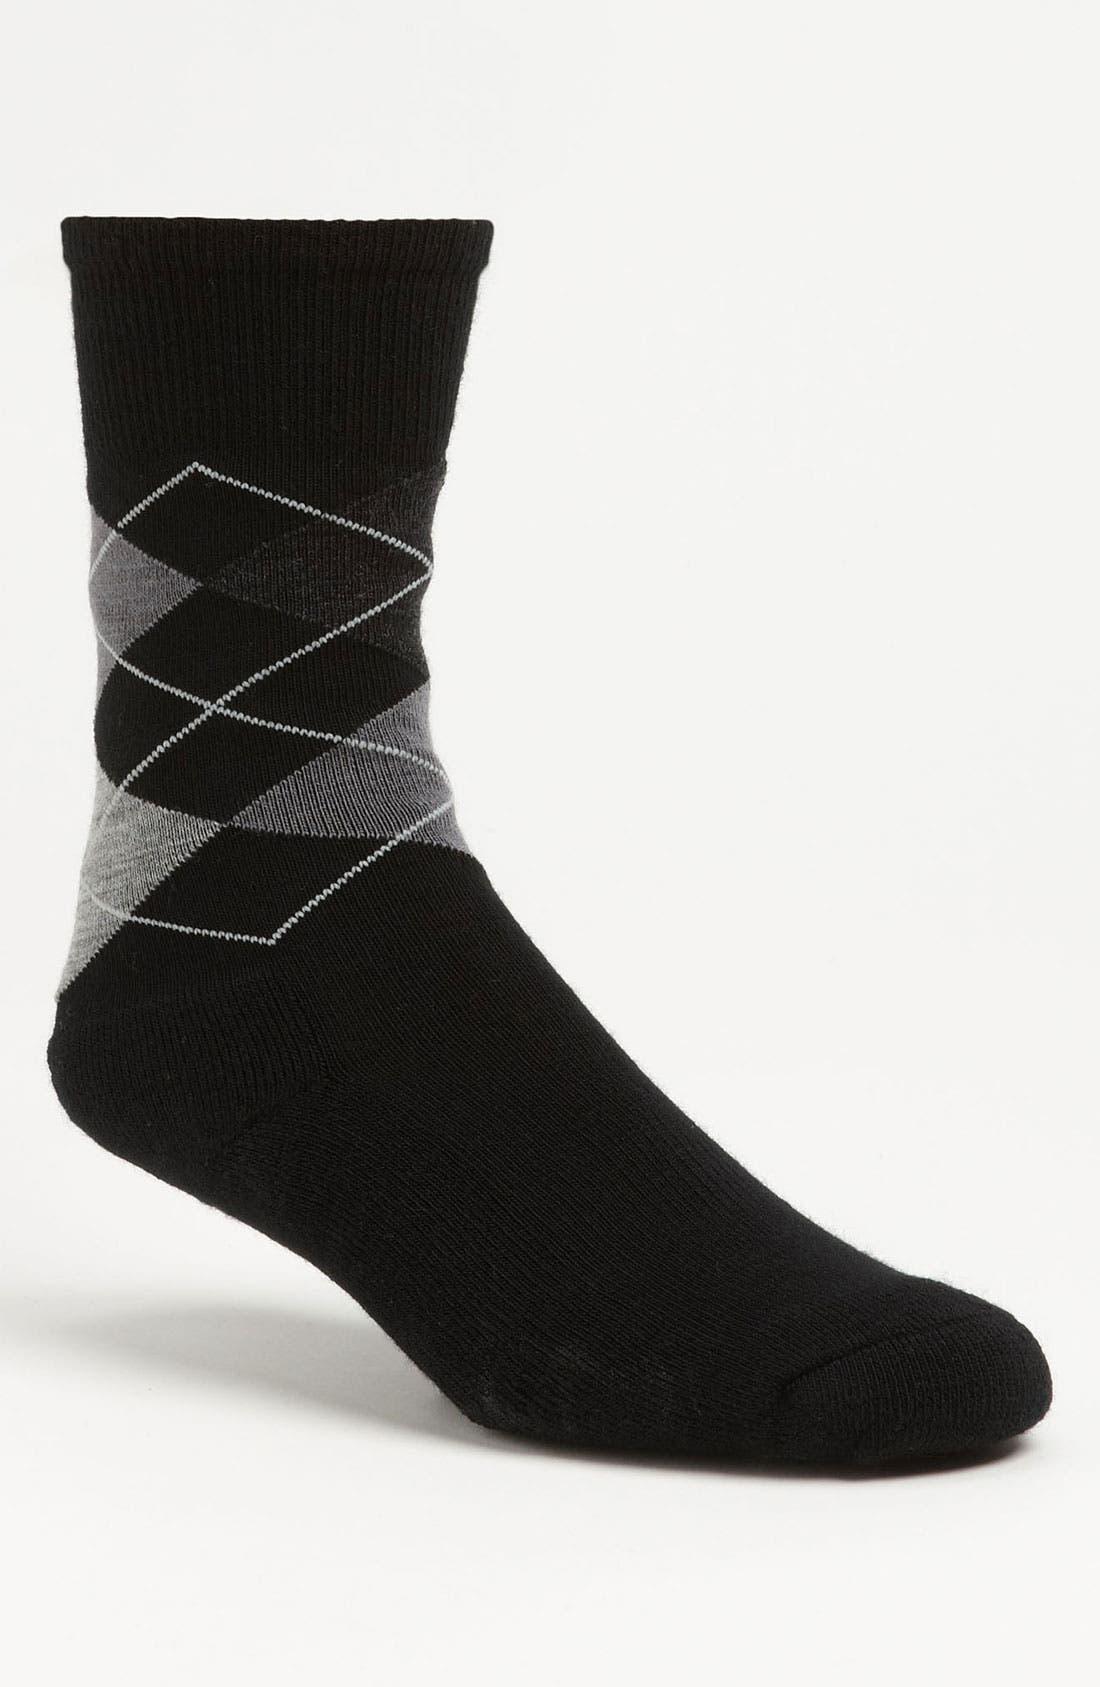 Alternate Image 1 Selected - Smartwool 'Diamond Jim' Socks